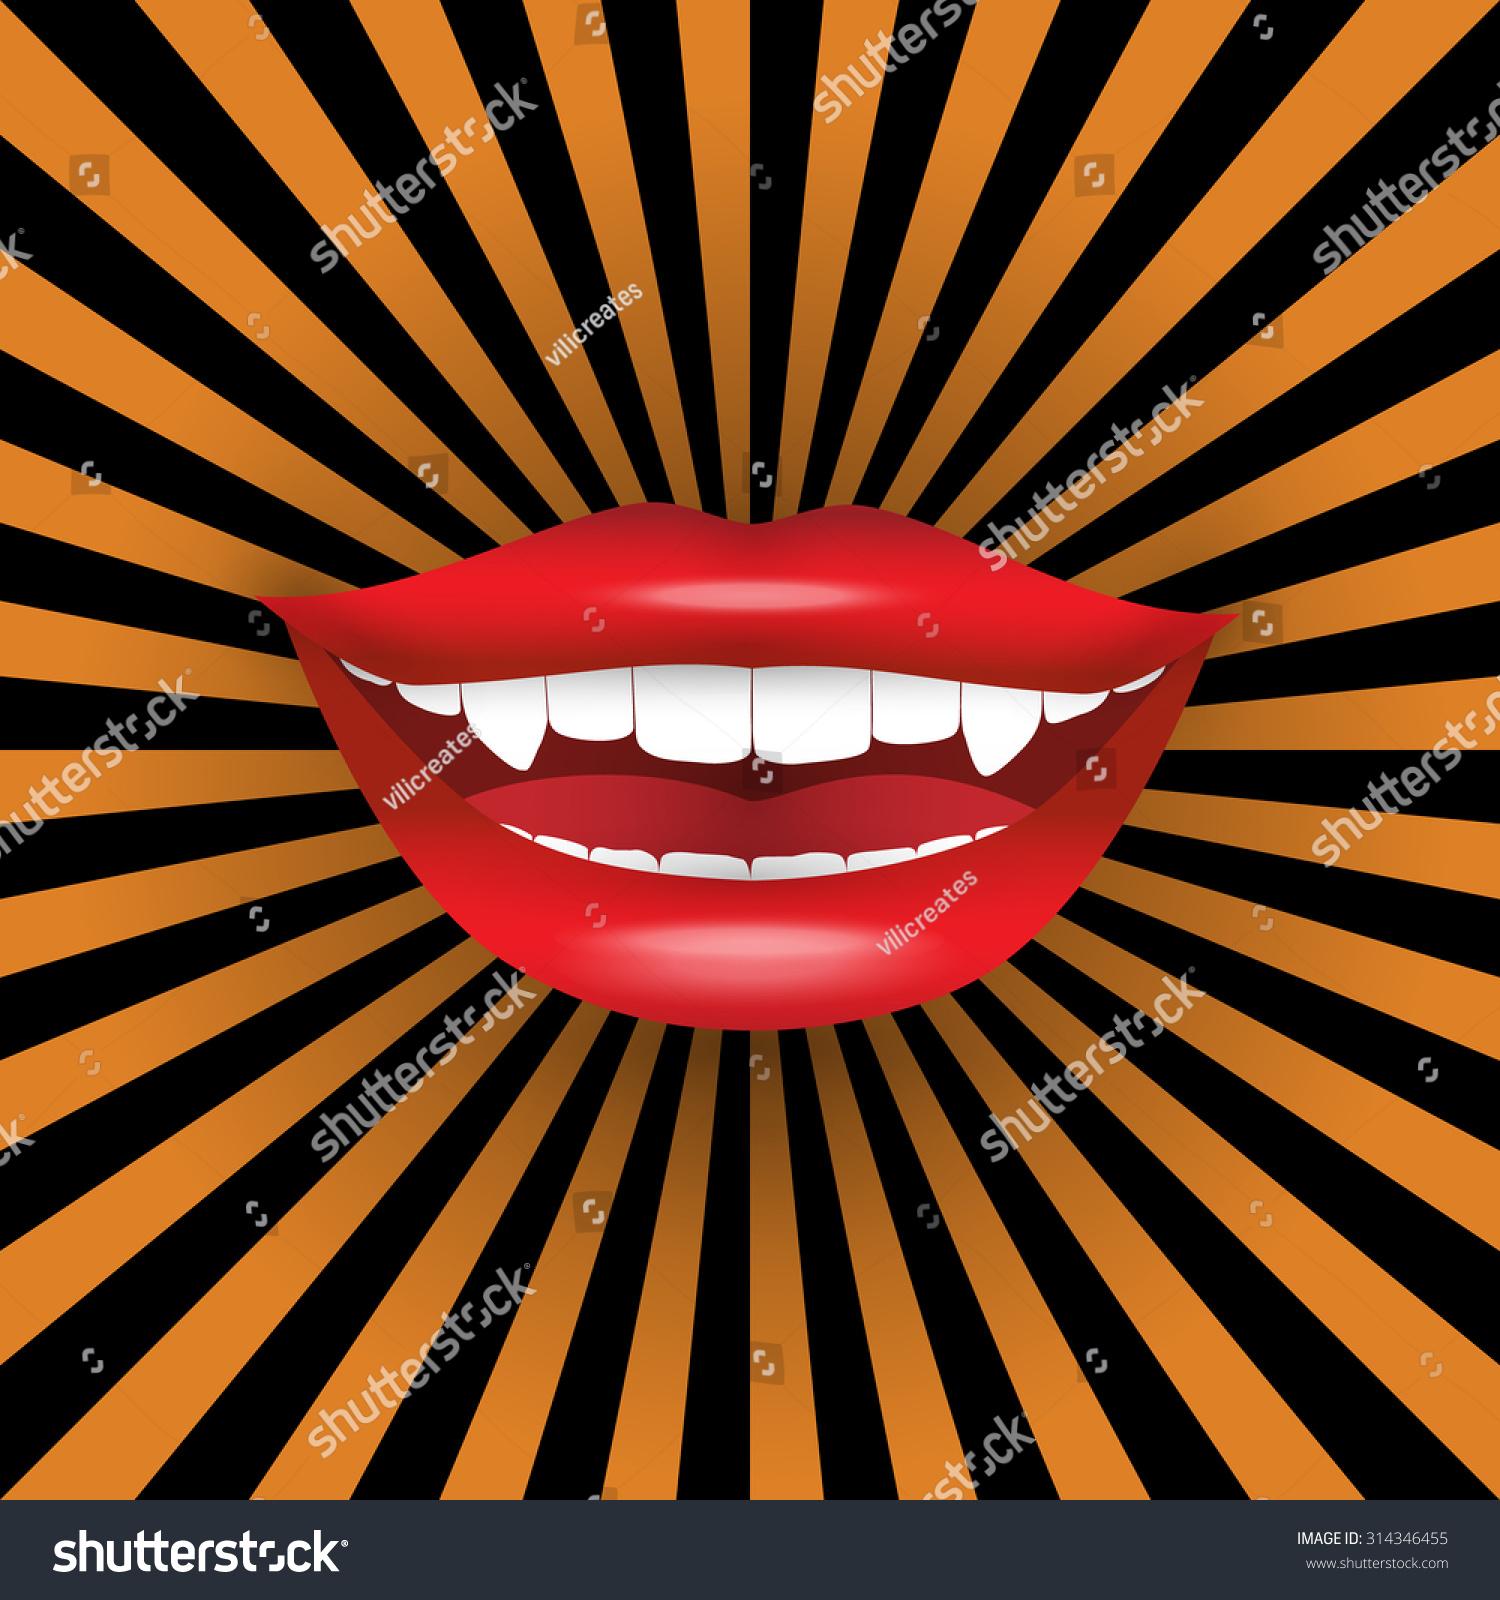 Royalty-free Halloween poster. Seductive vampire… #314346455 Stock ...